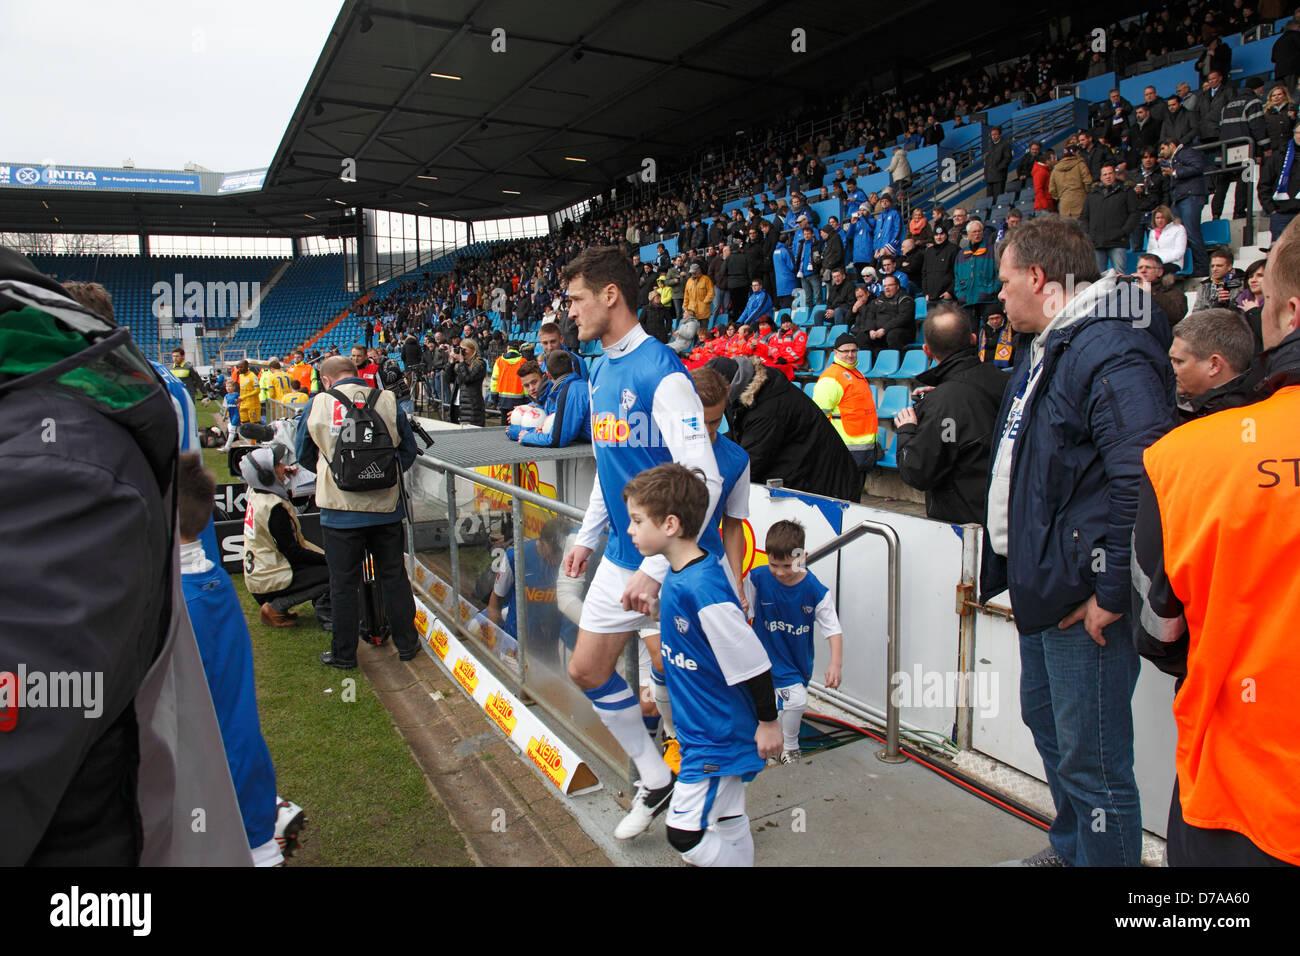 sports, football, 2. Bundesliga, German second league, 2012/2013, VfL Bochum versus Eintracht Brunswick 0:1, rewirpowerstadion - Stock Image